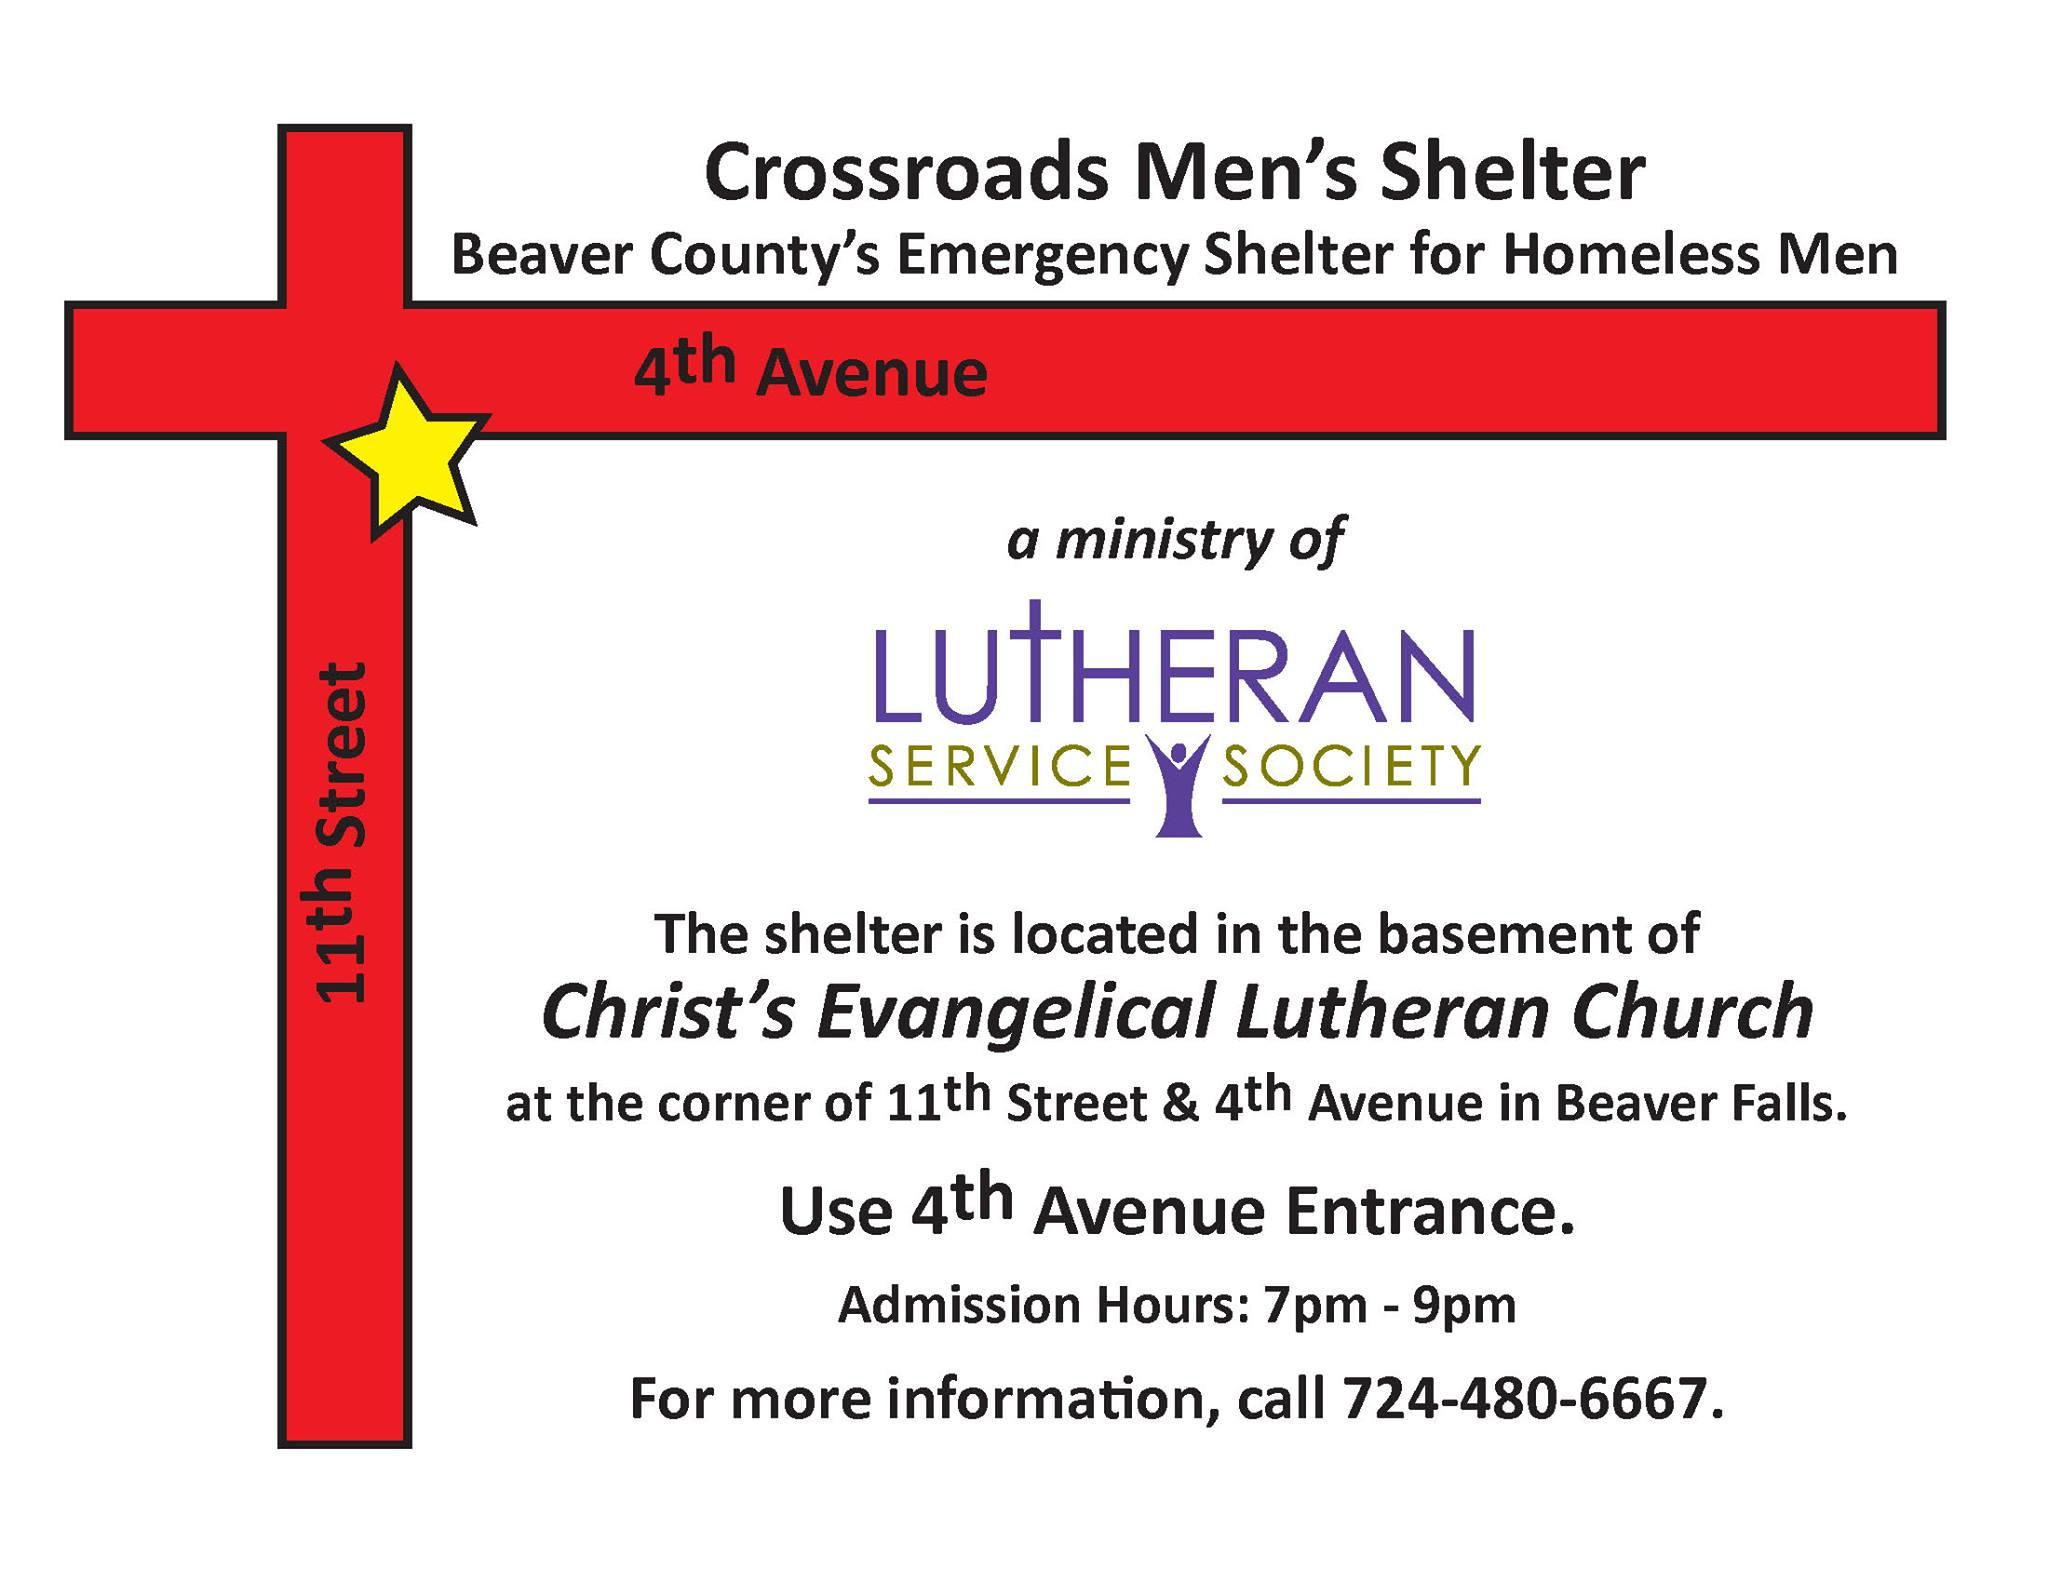 picture of Crossroads Shelter for Homeless Men